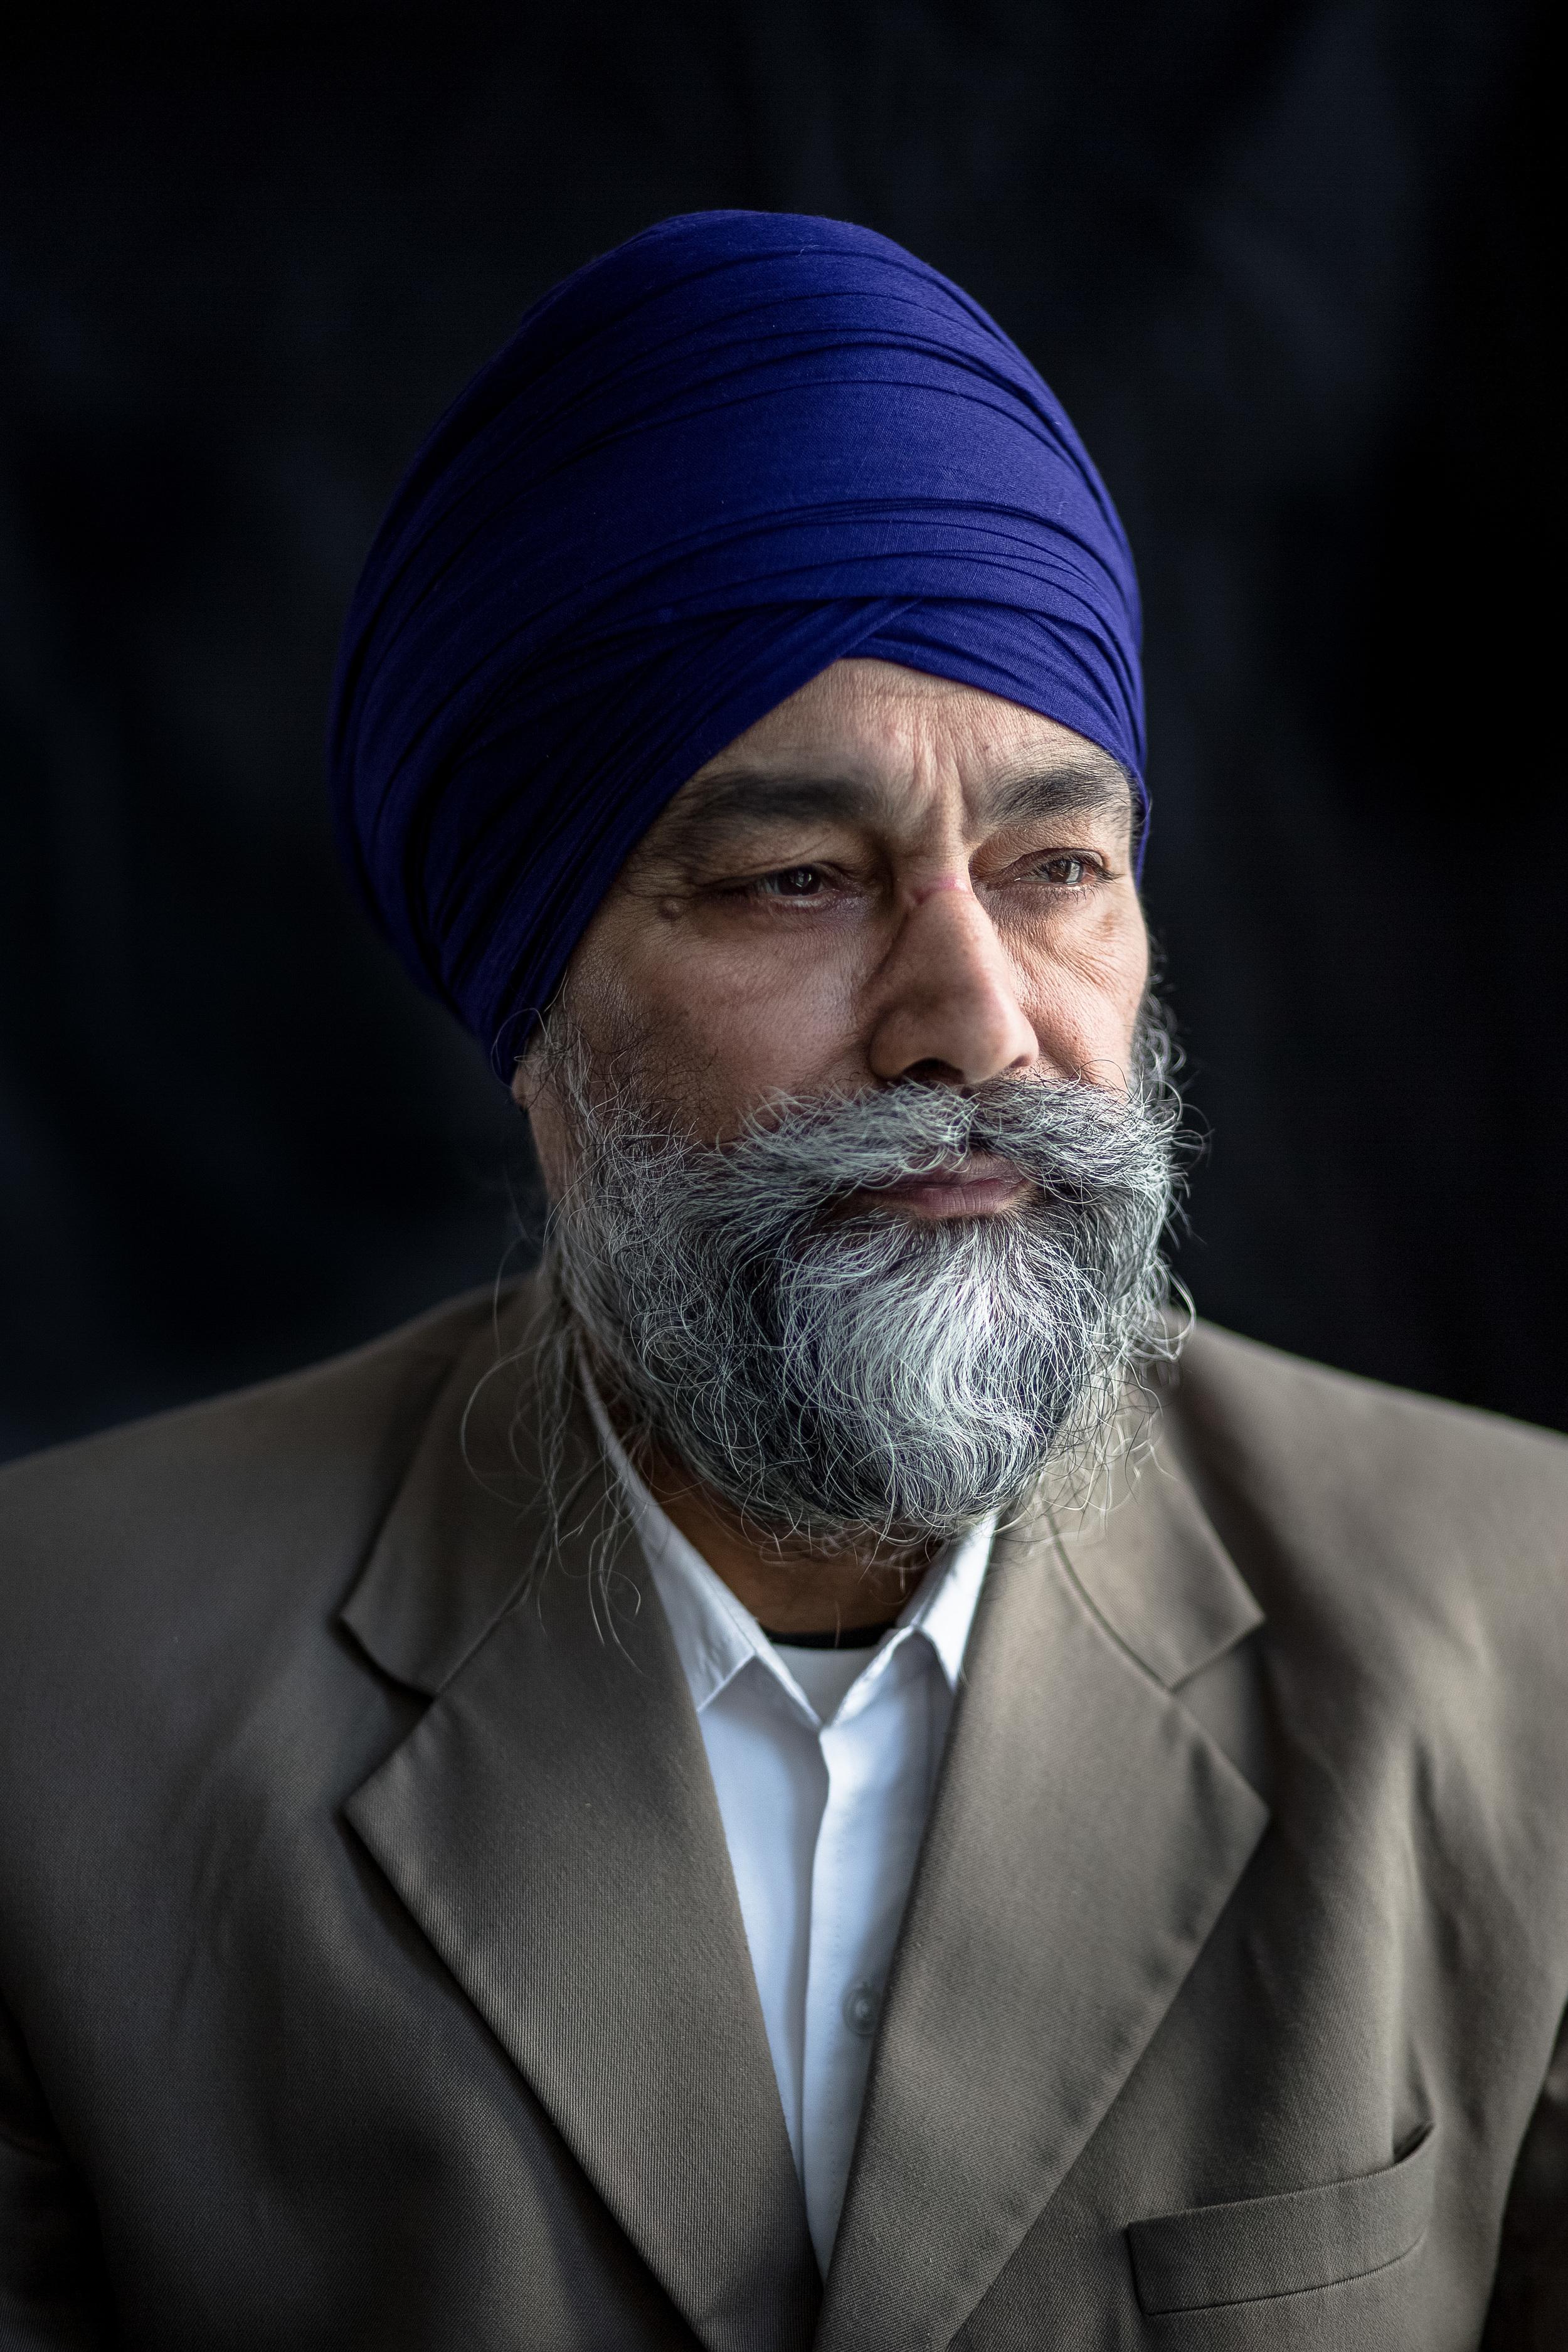 Paramjit Singh Dhindsa